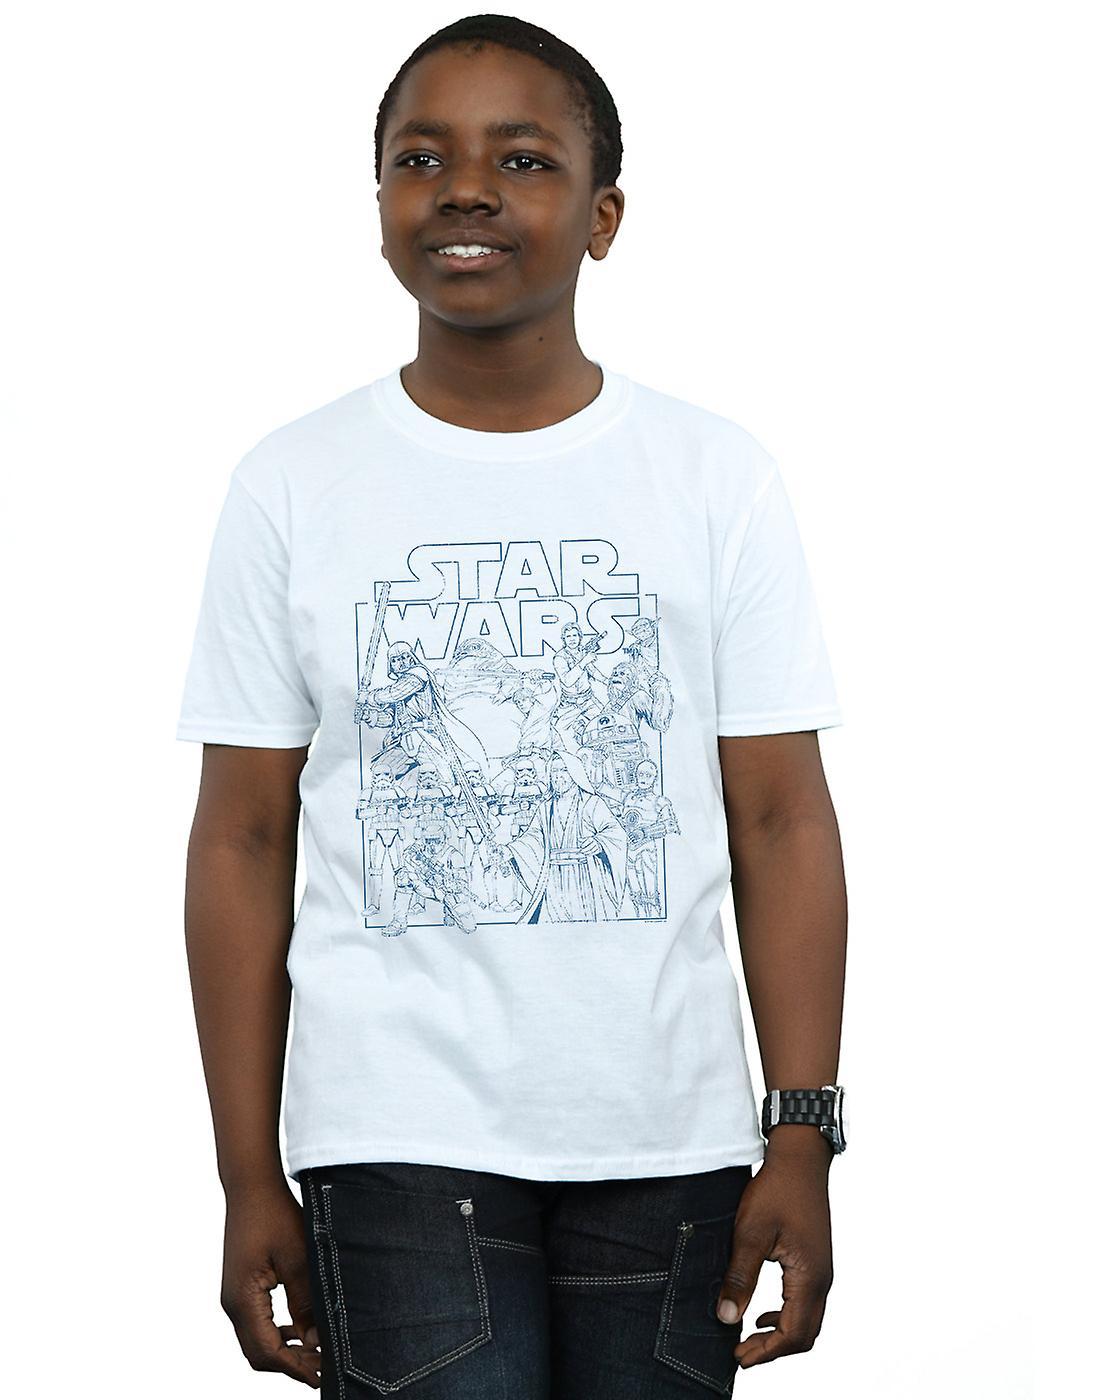 Star Wars Boys Outlined Sketch T-Shirt